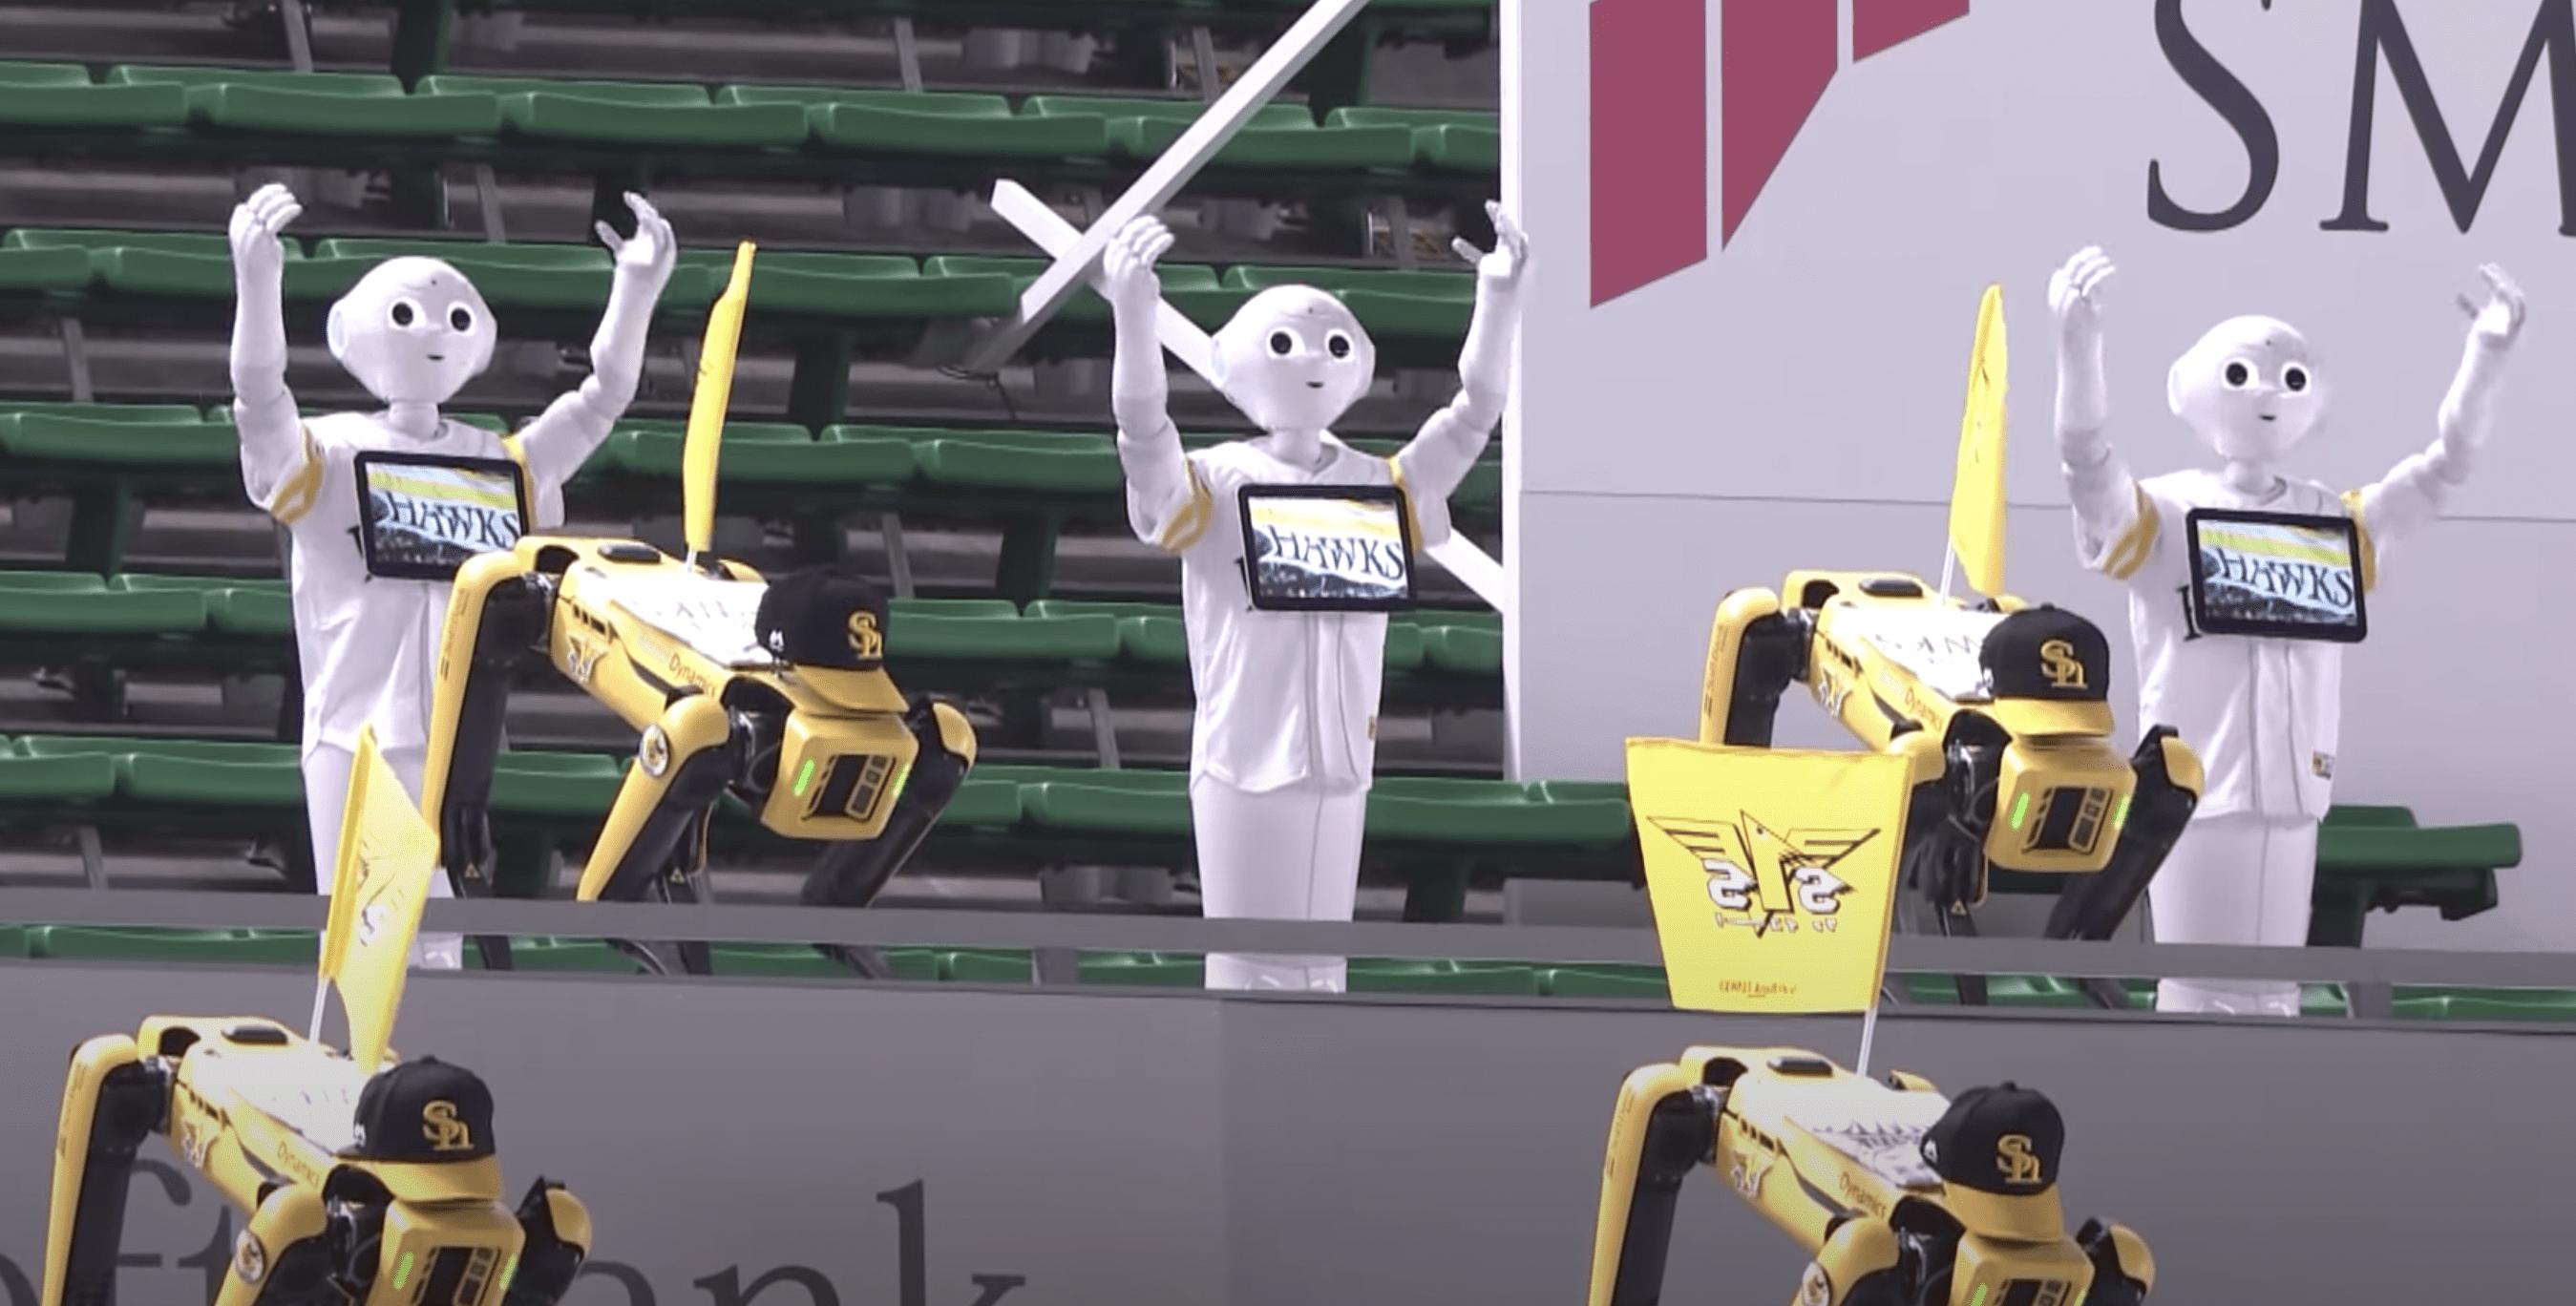 Debido a la pandemia, robots danzantes reemplazan a fanáticos en un juego de béisbol japonés